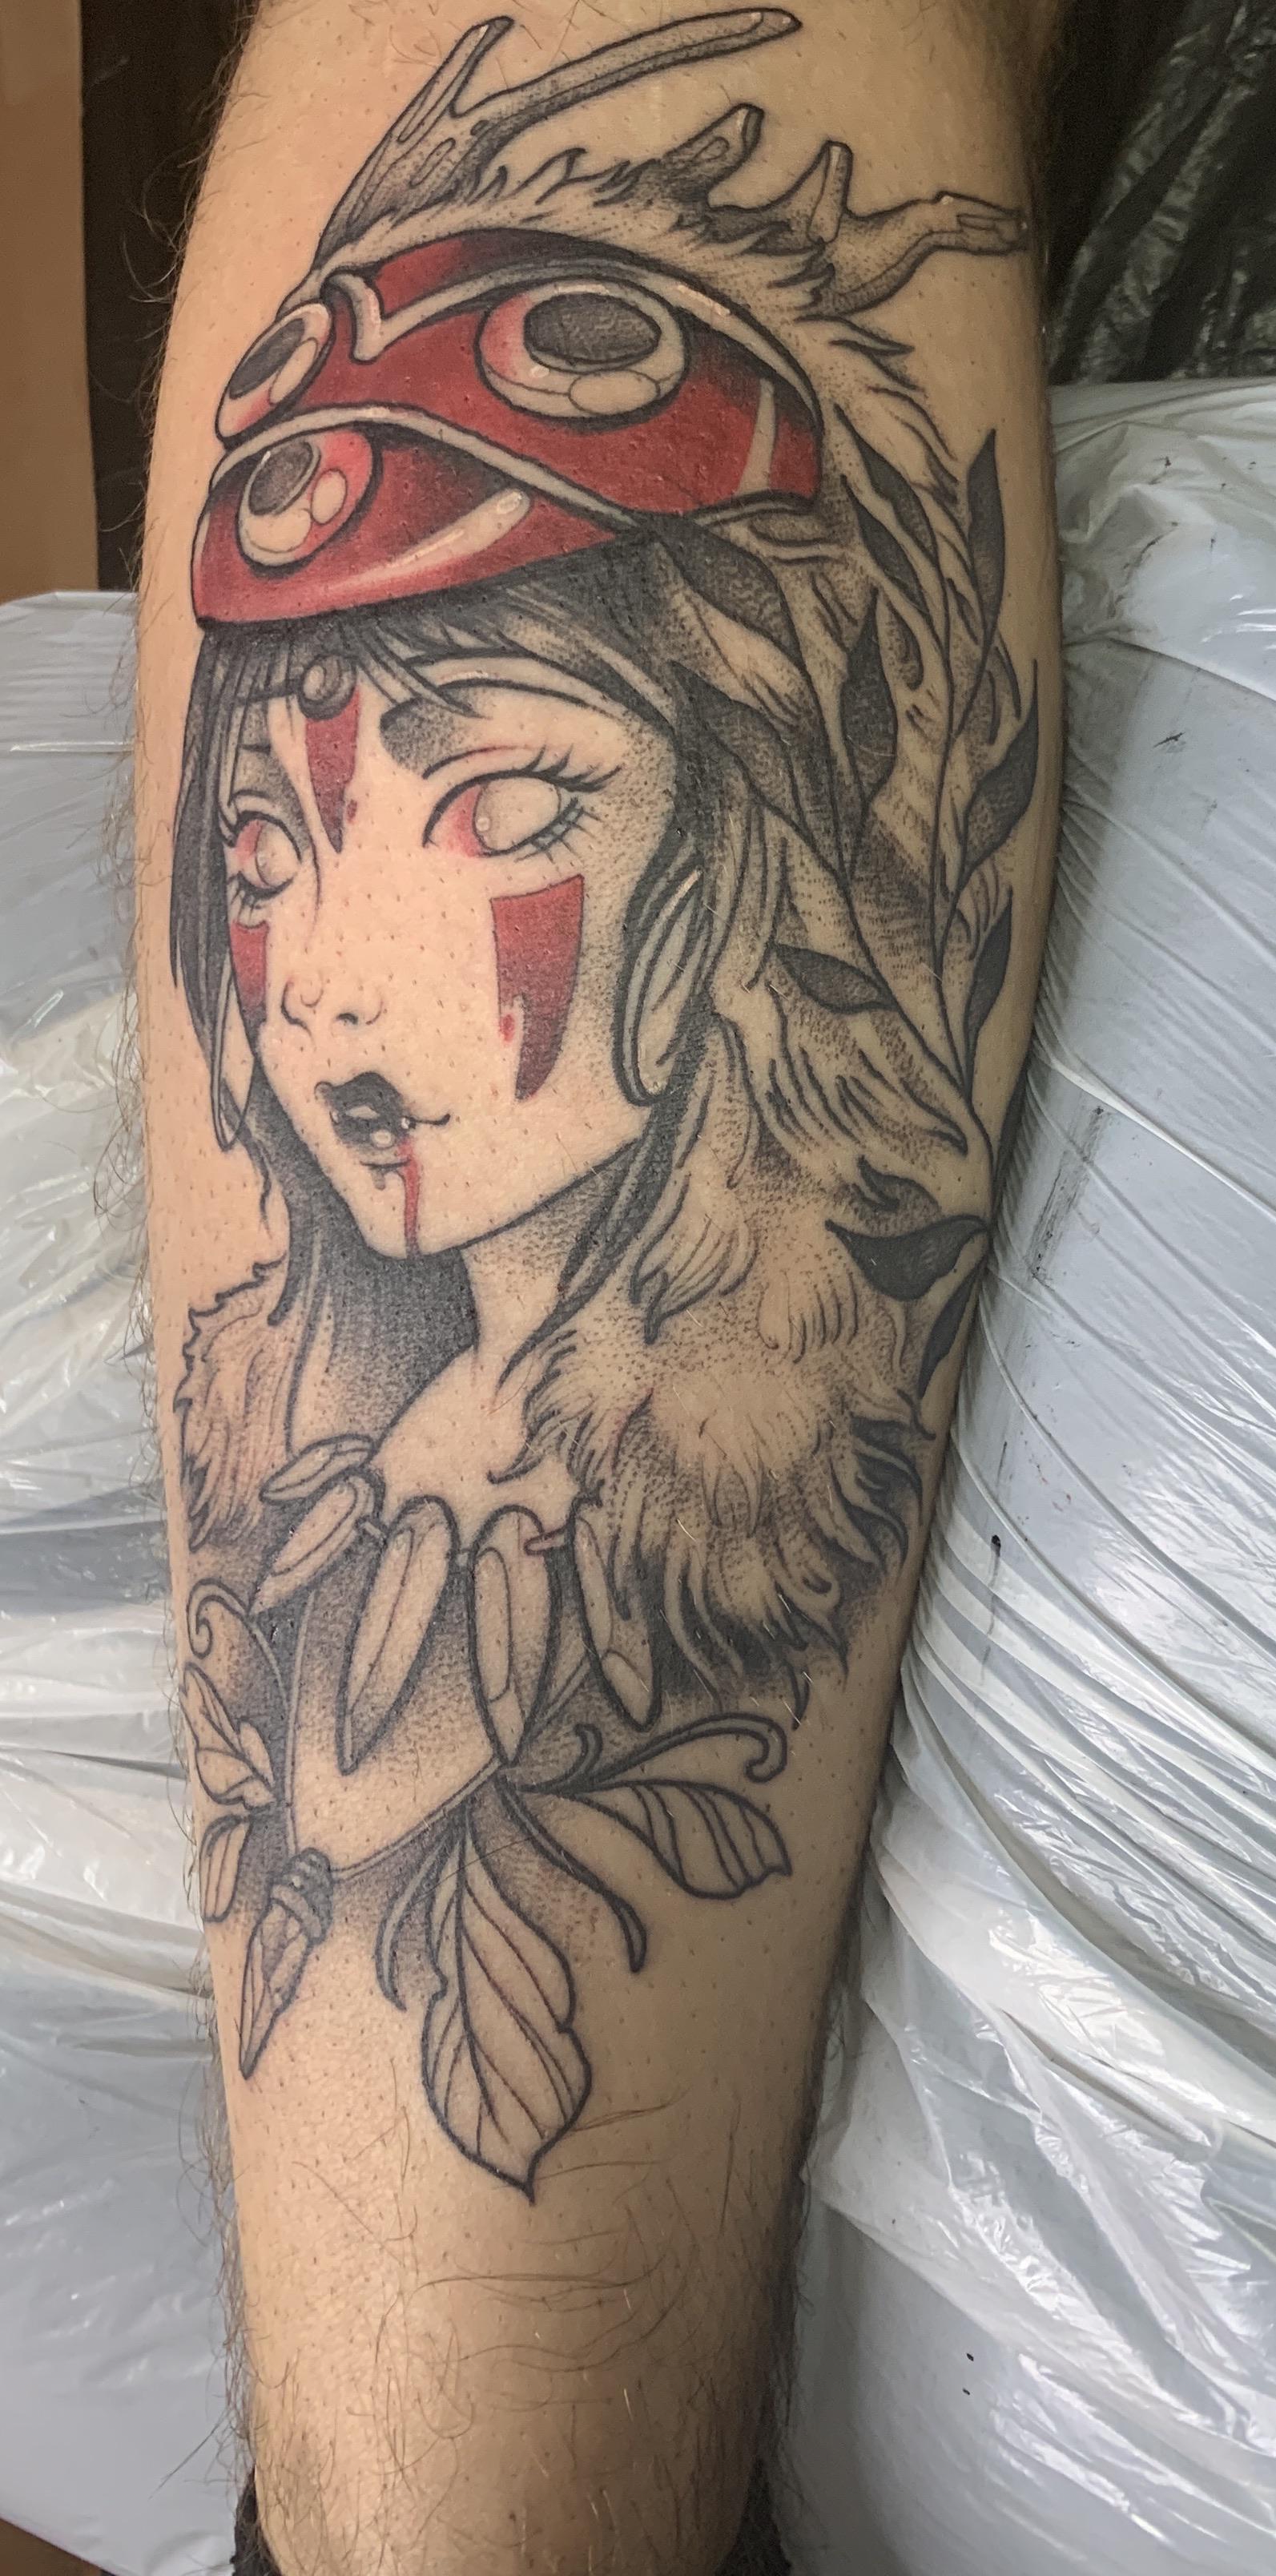 The Best Princess Mononoke Tattoos - Tattoo Insider